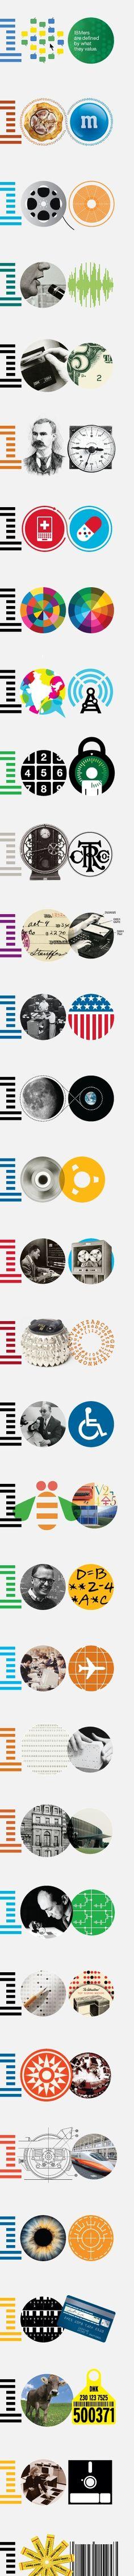 IBM 100 Years Celebration